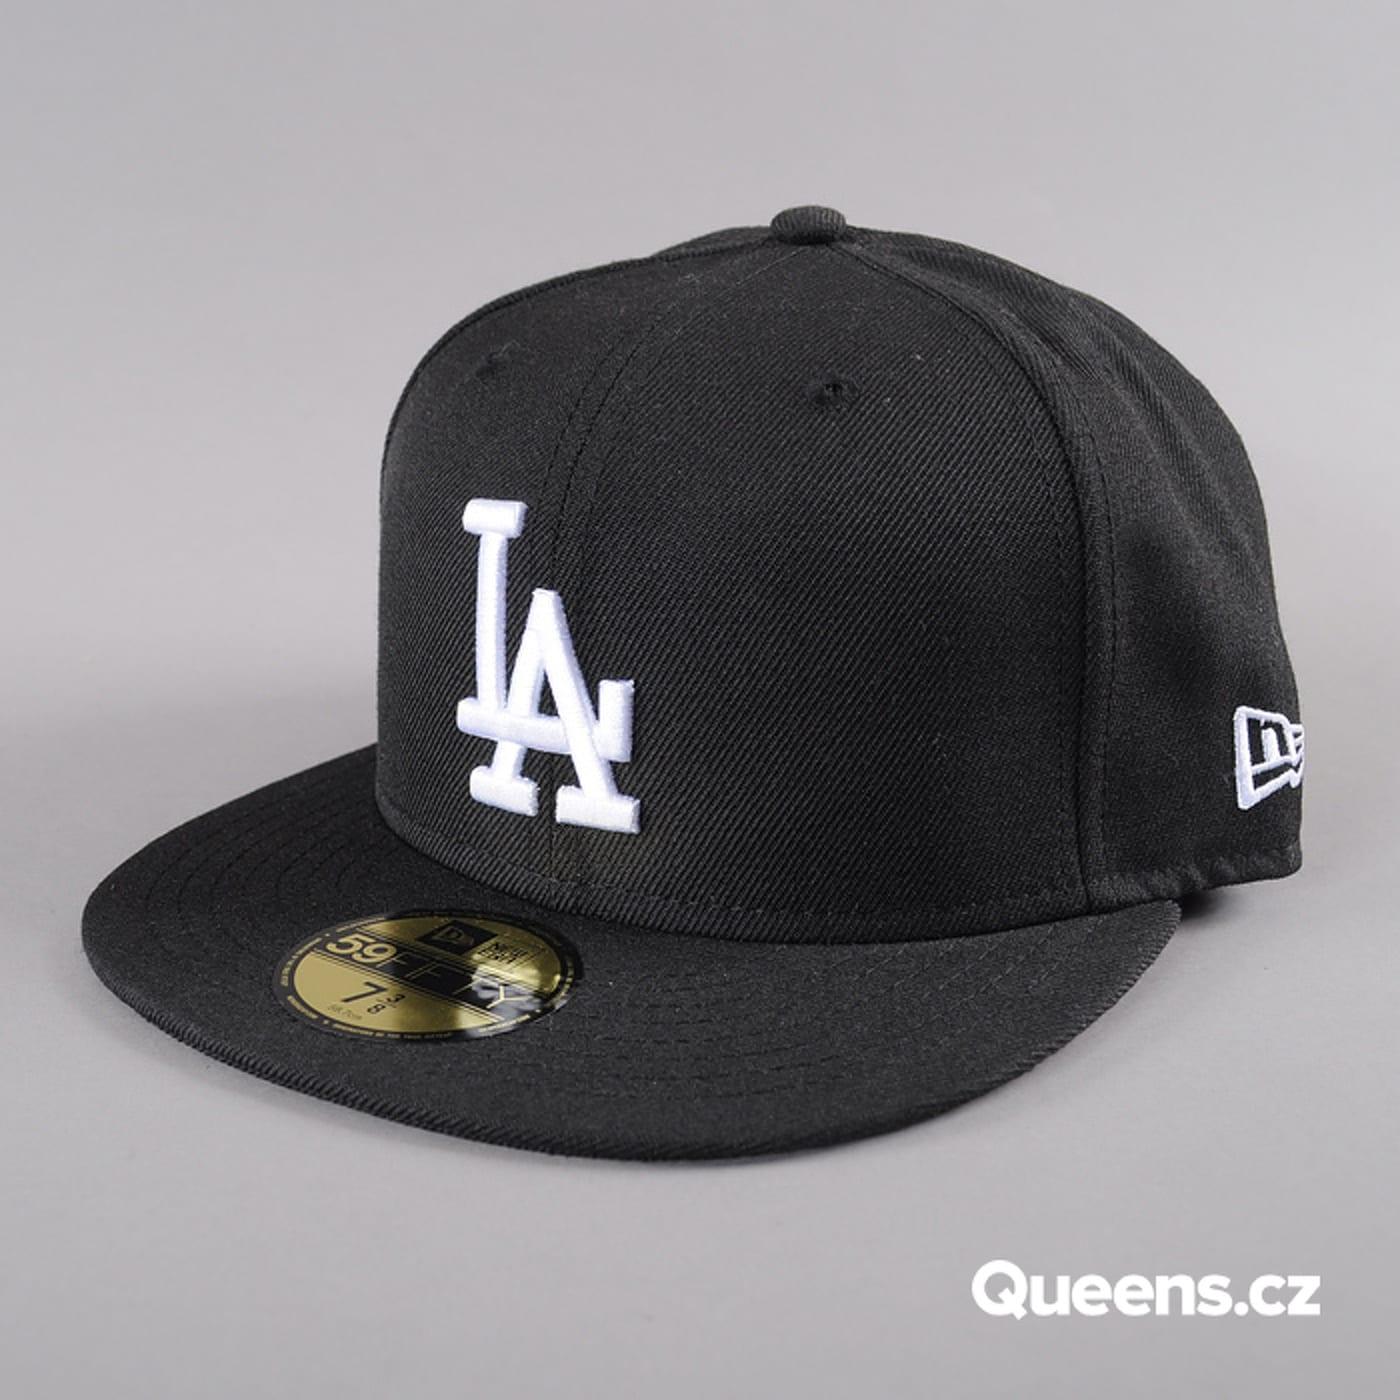 New Era MLB Basic LA schwarz / weiß